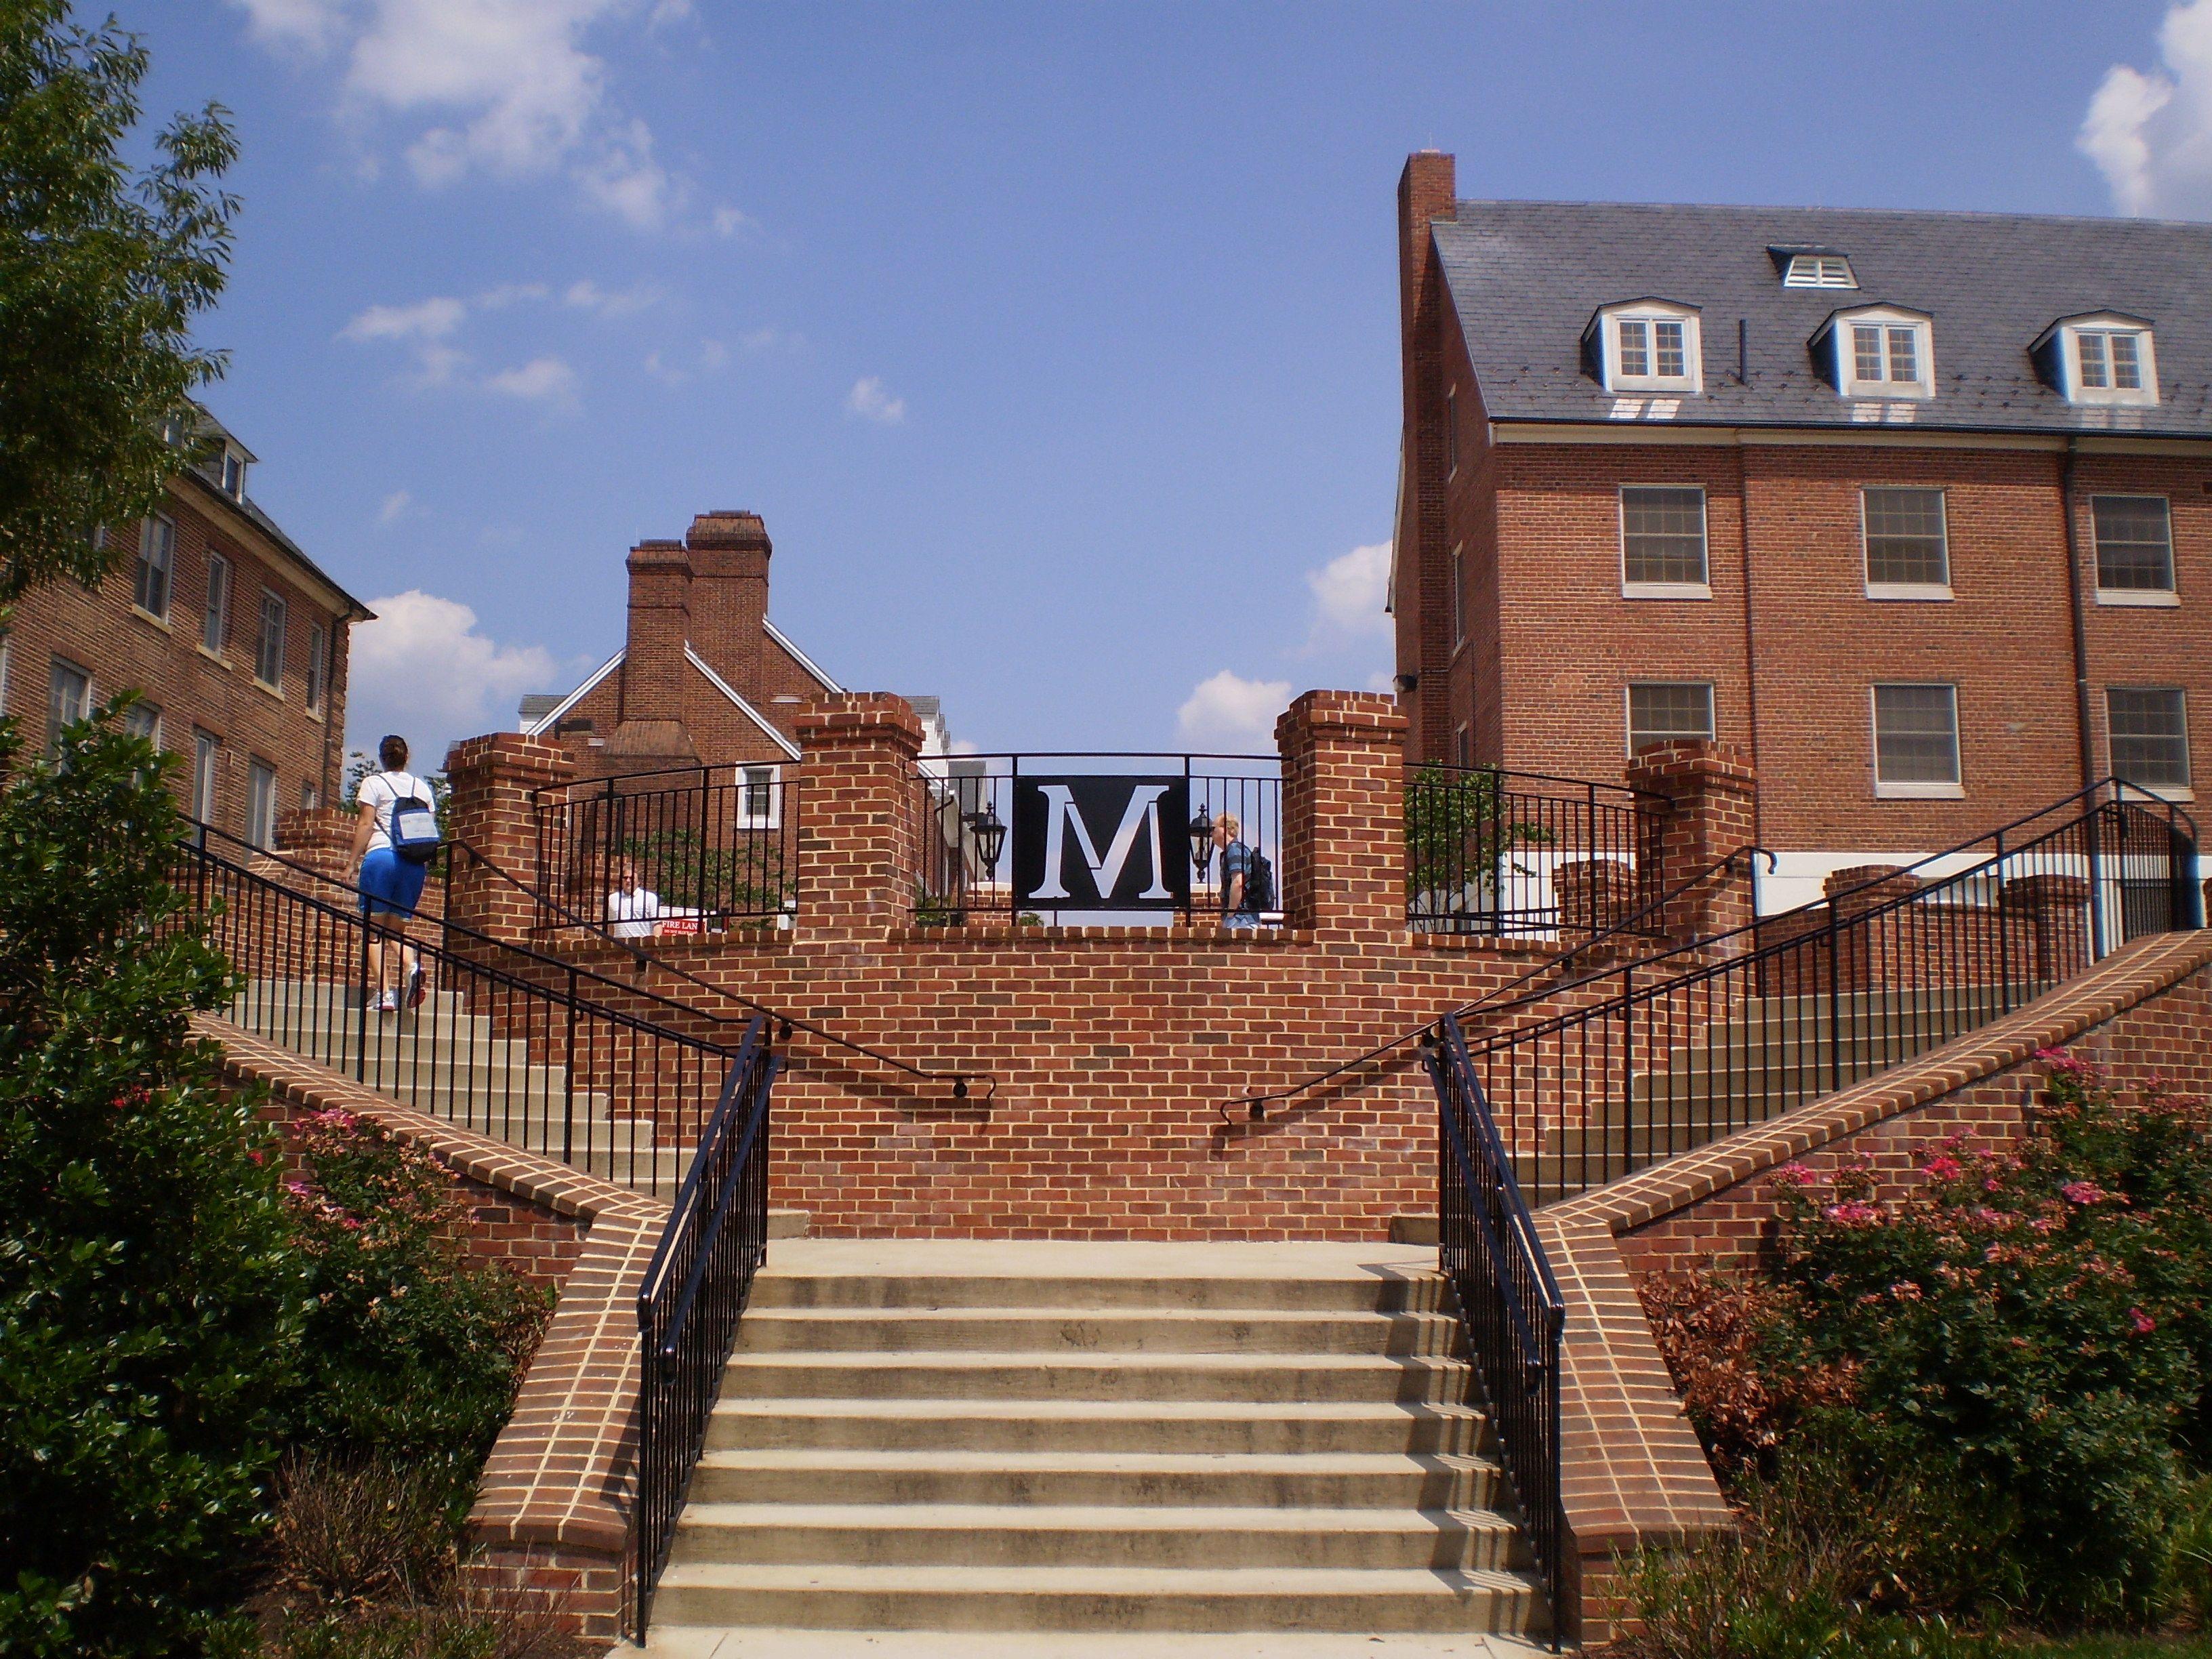 Home university of maryland baltimore - 5 Reasons I Chose University Of Maryland